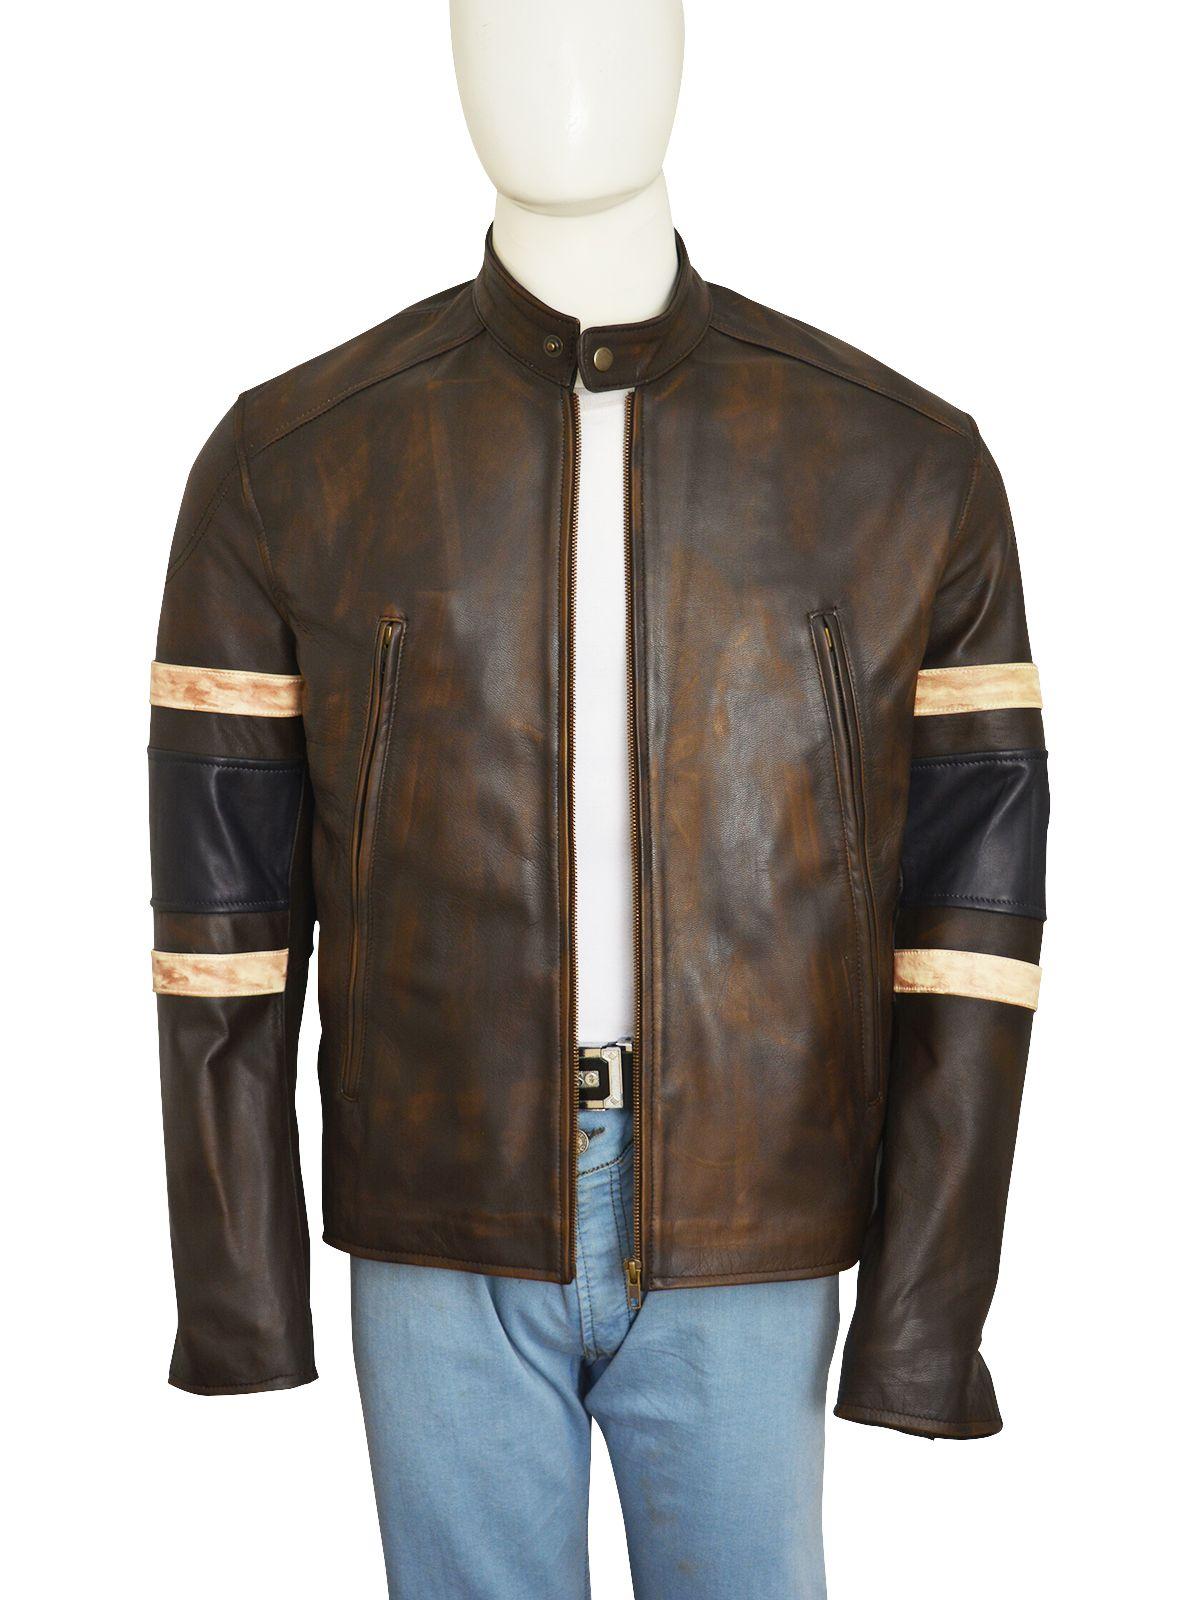 Distressed Brown Retro Zipped Biker Jacket Inspired by X-Men Jackman Wolverine